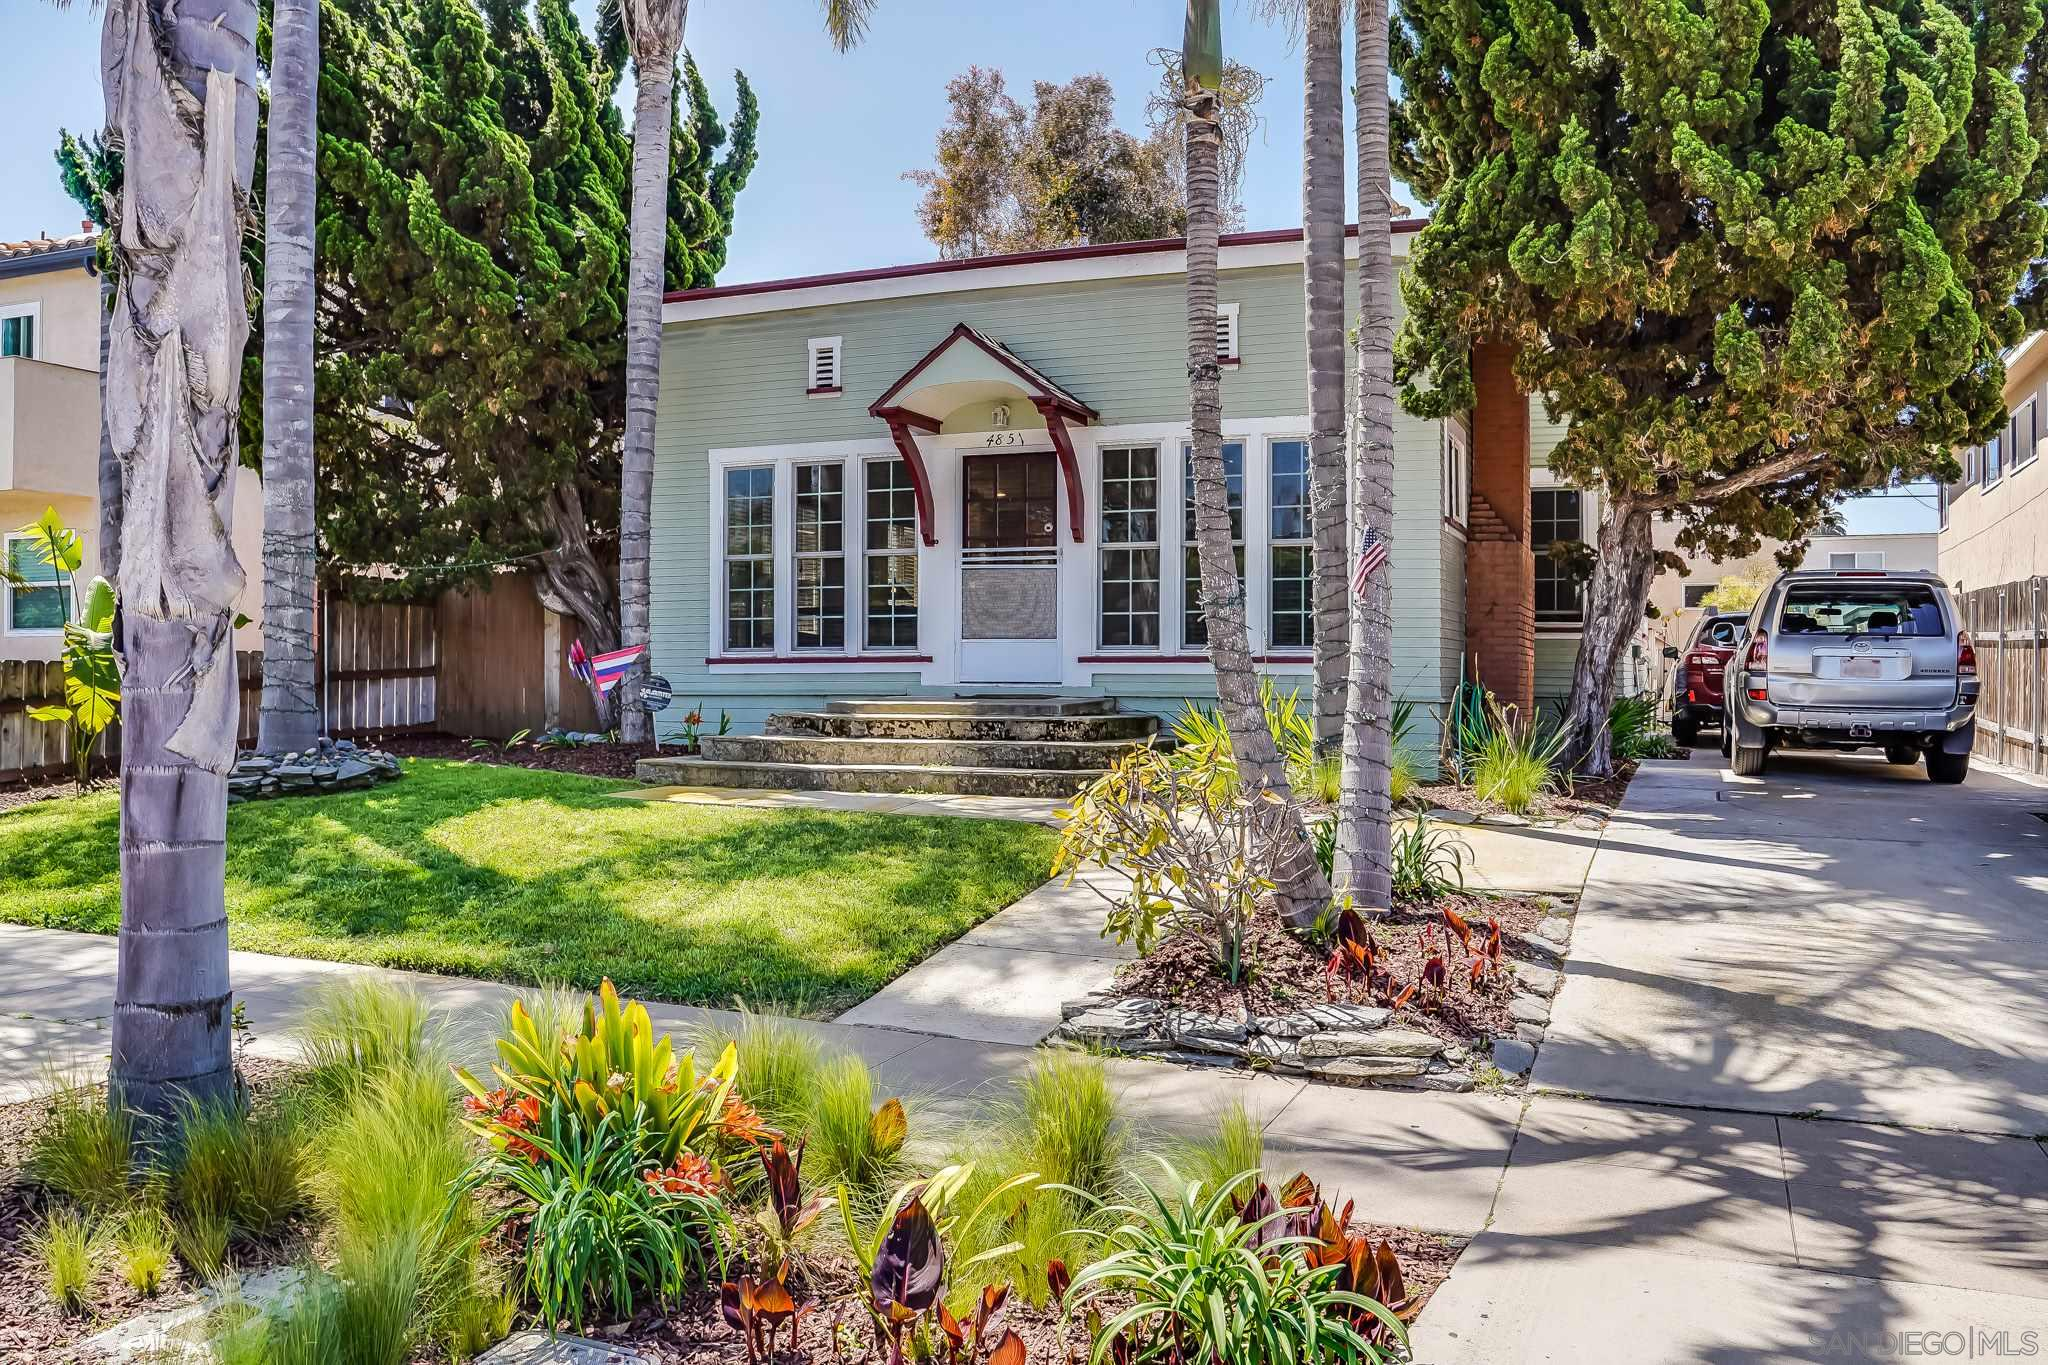 4851-55 Narragansett Ave, San Diego, CA 92107